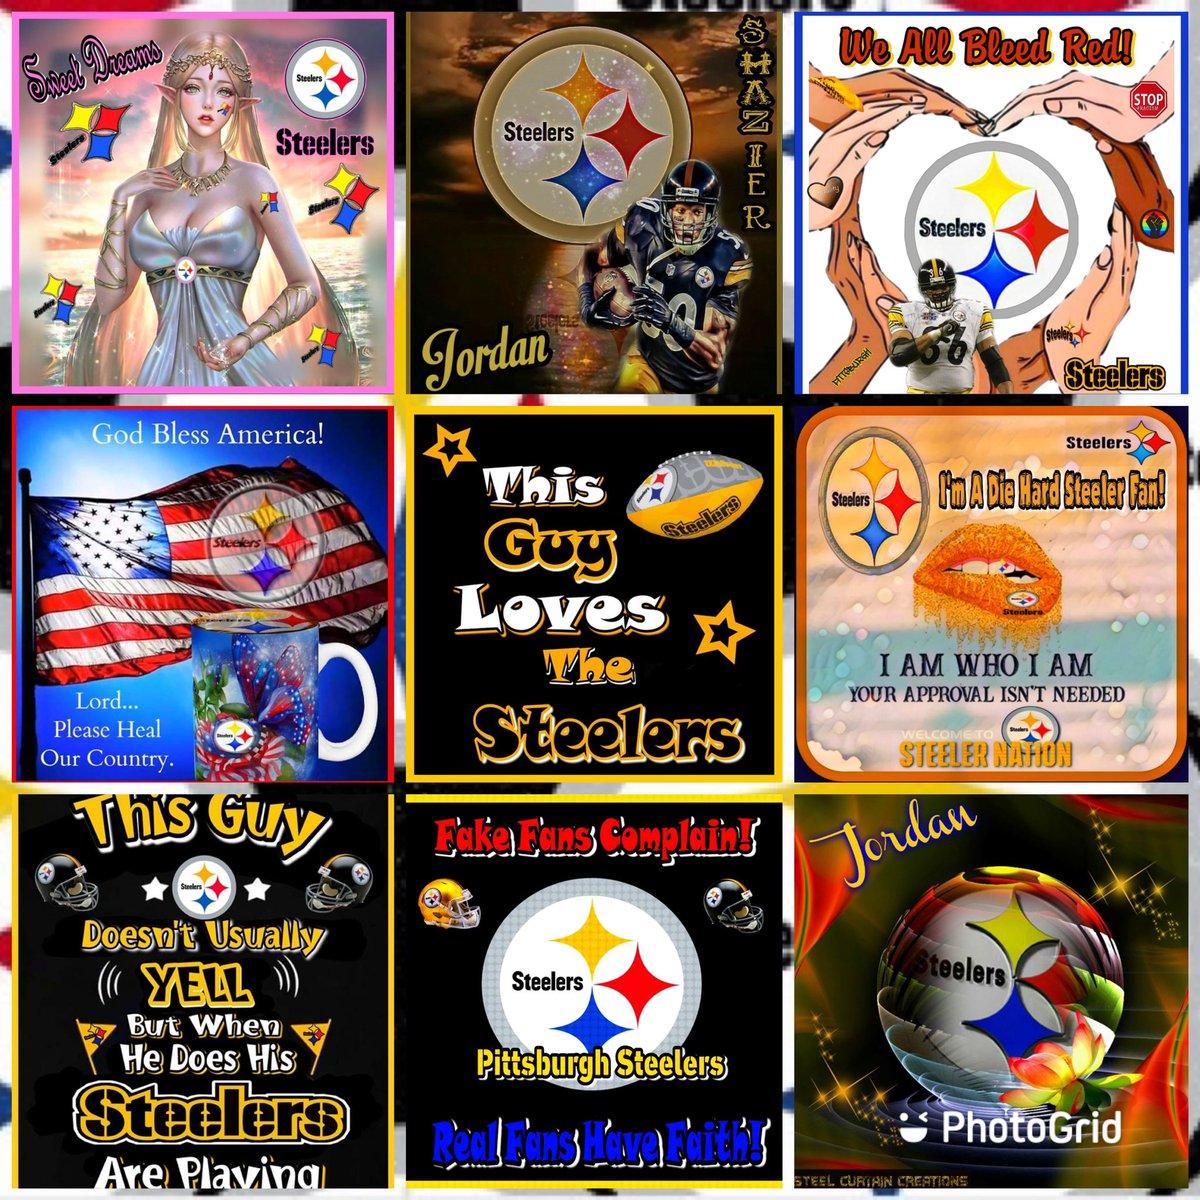 Goodnight everybody & #SteelersNation